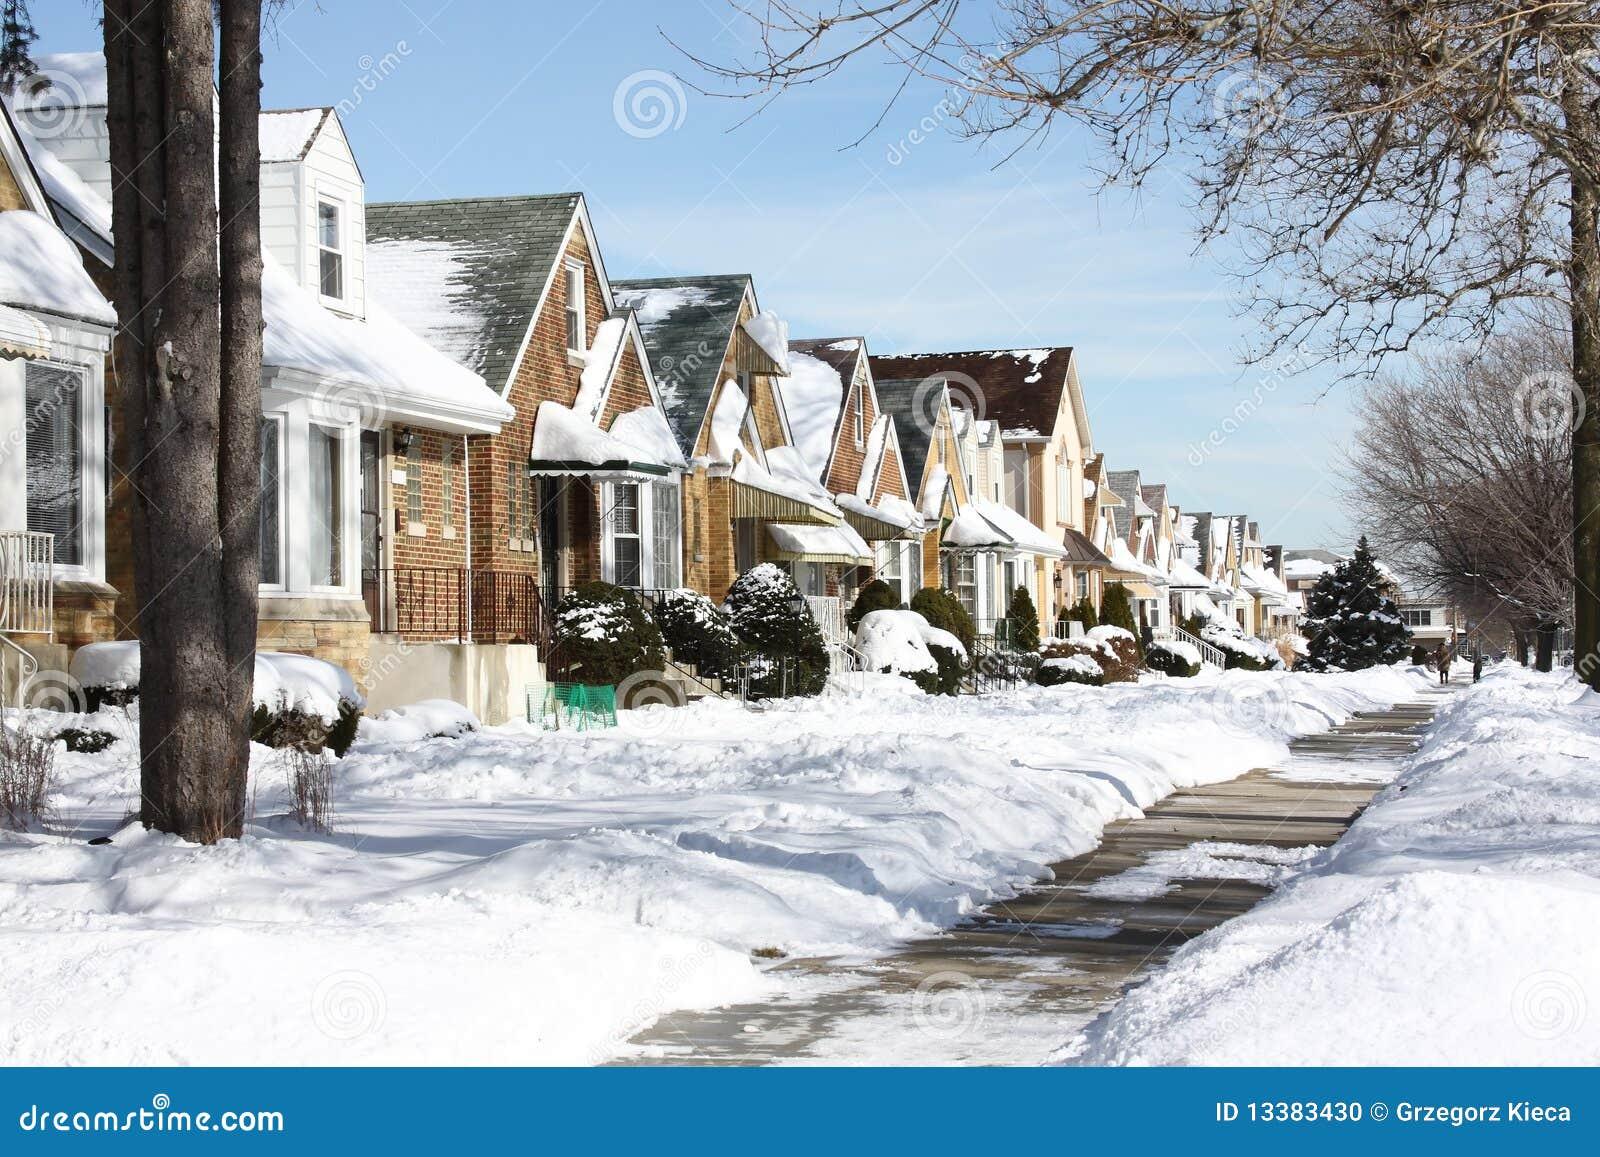 Snowy Chicago Neighborhood Stock Photo Image 13383430